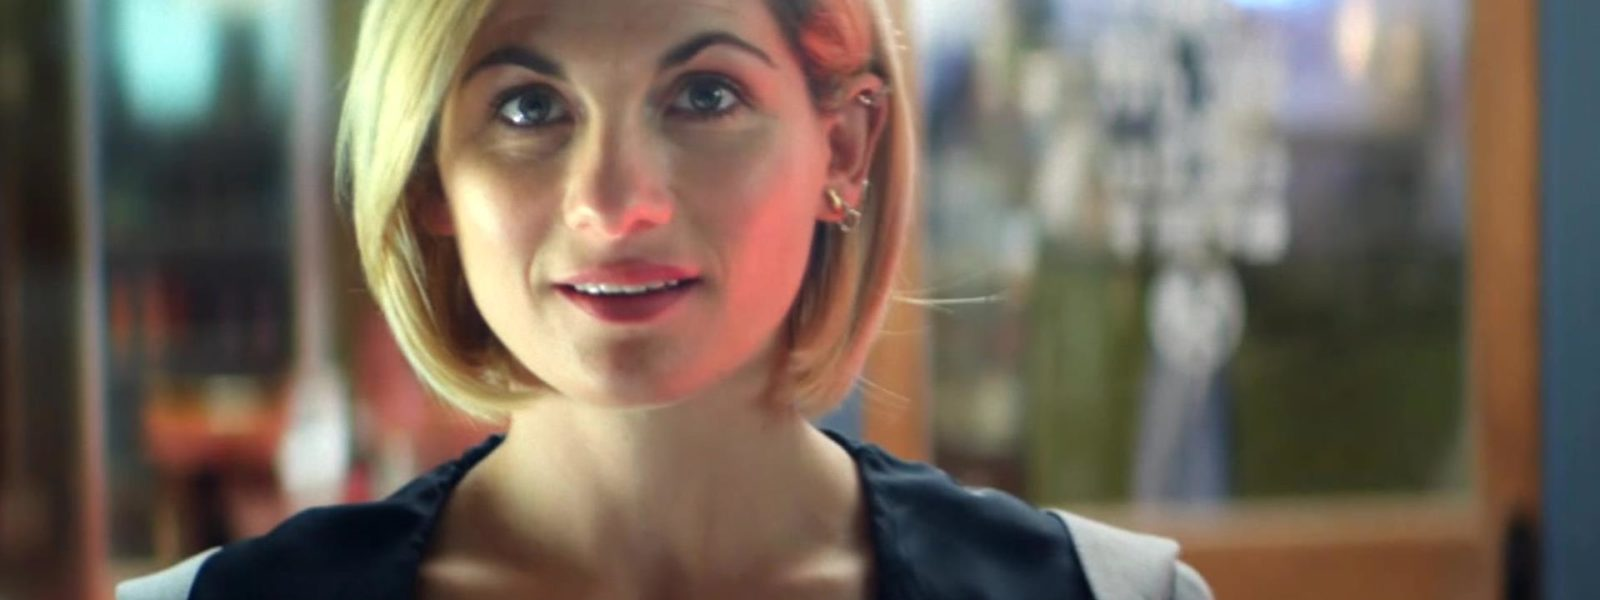 Doctor_Who_S11_UK_World_Cup_Promo_for_Social_YouTubePreset_KE10_1920x1080_1277366851917